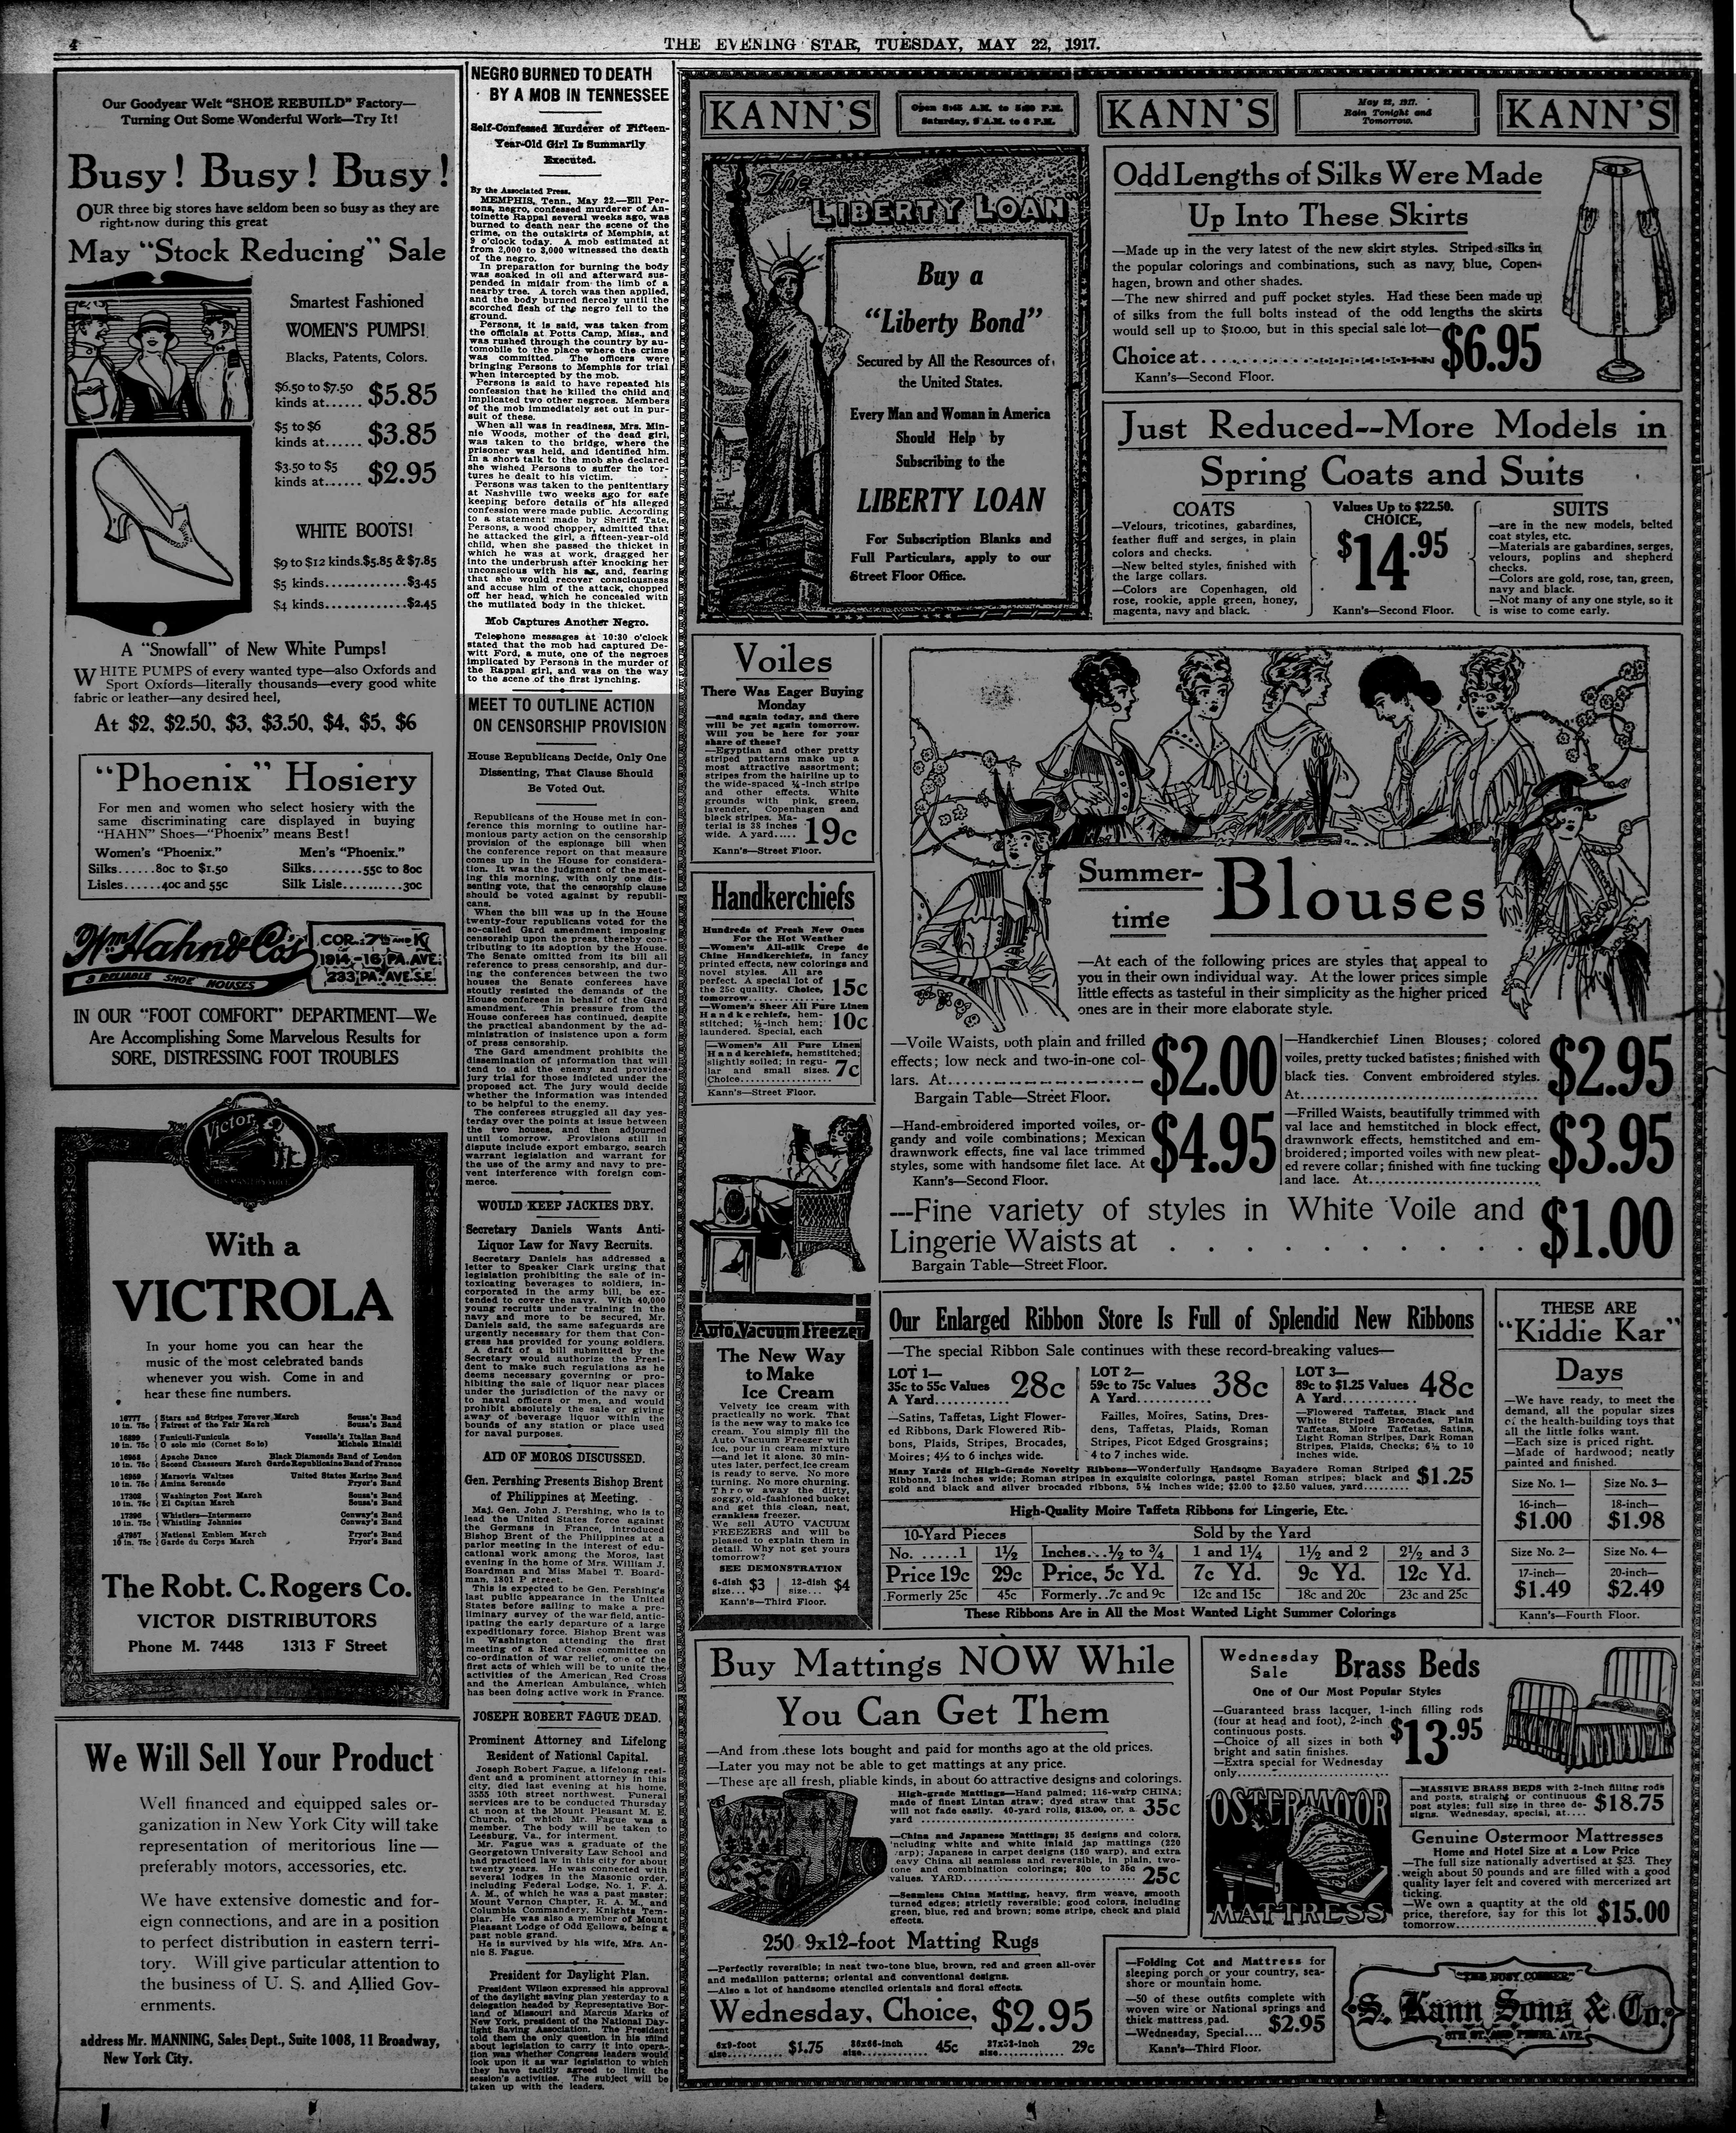 Evening Star, 5/22/1917